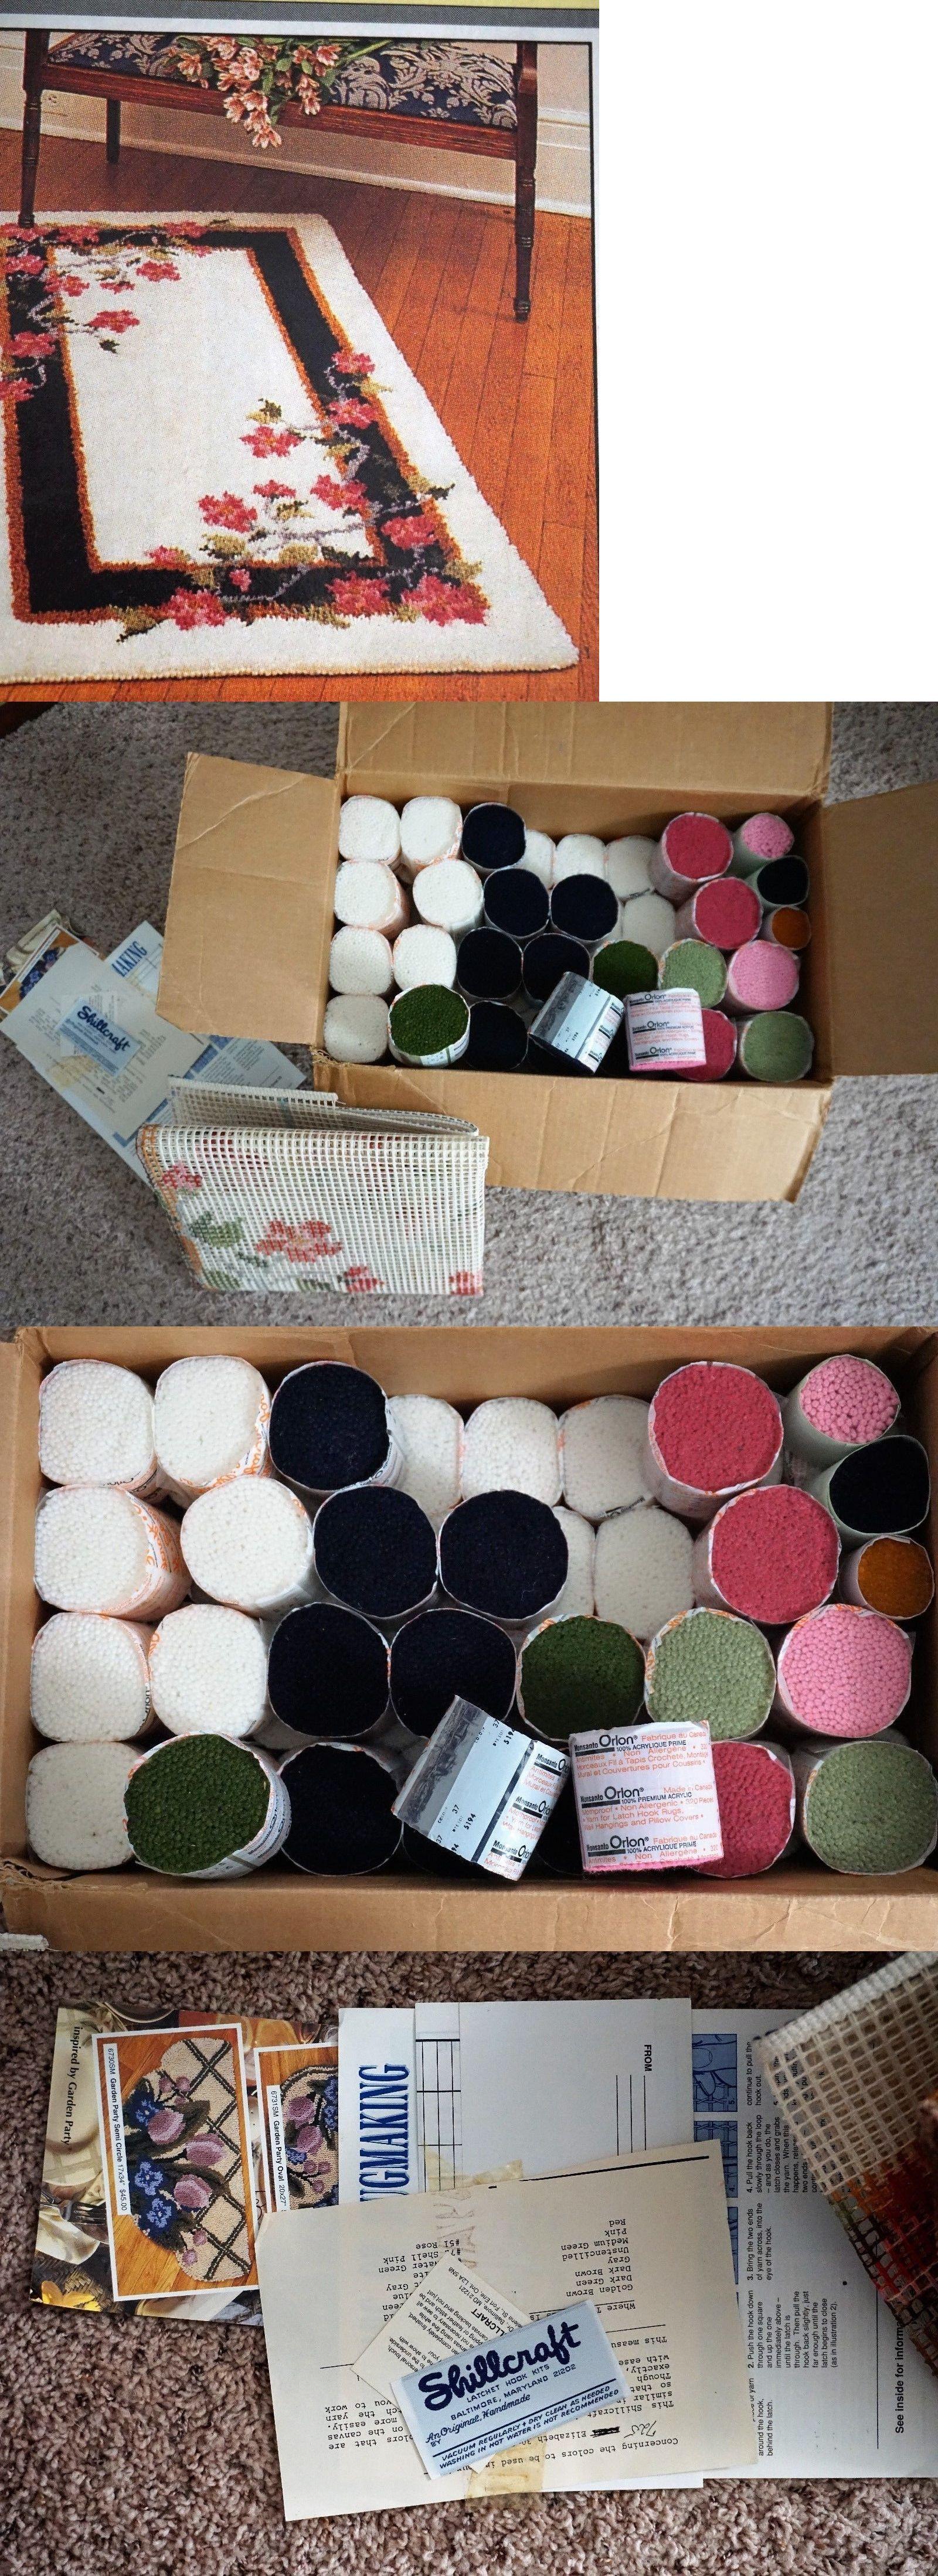 Latch Hooking Kits 28148 Vintage Readicut Shillcraft Hook Rug Canvas Kit Elizabeth 725 Orlon It Now Only 160 On Ebay